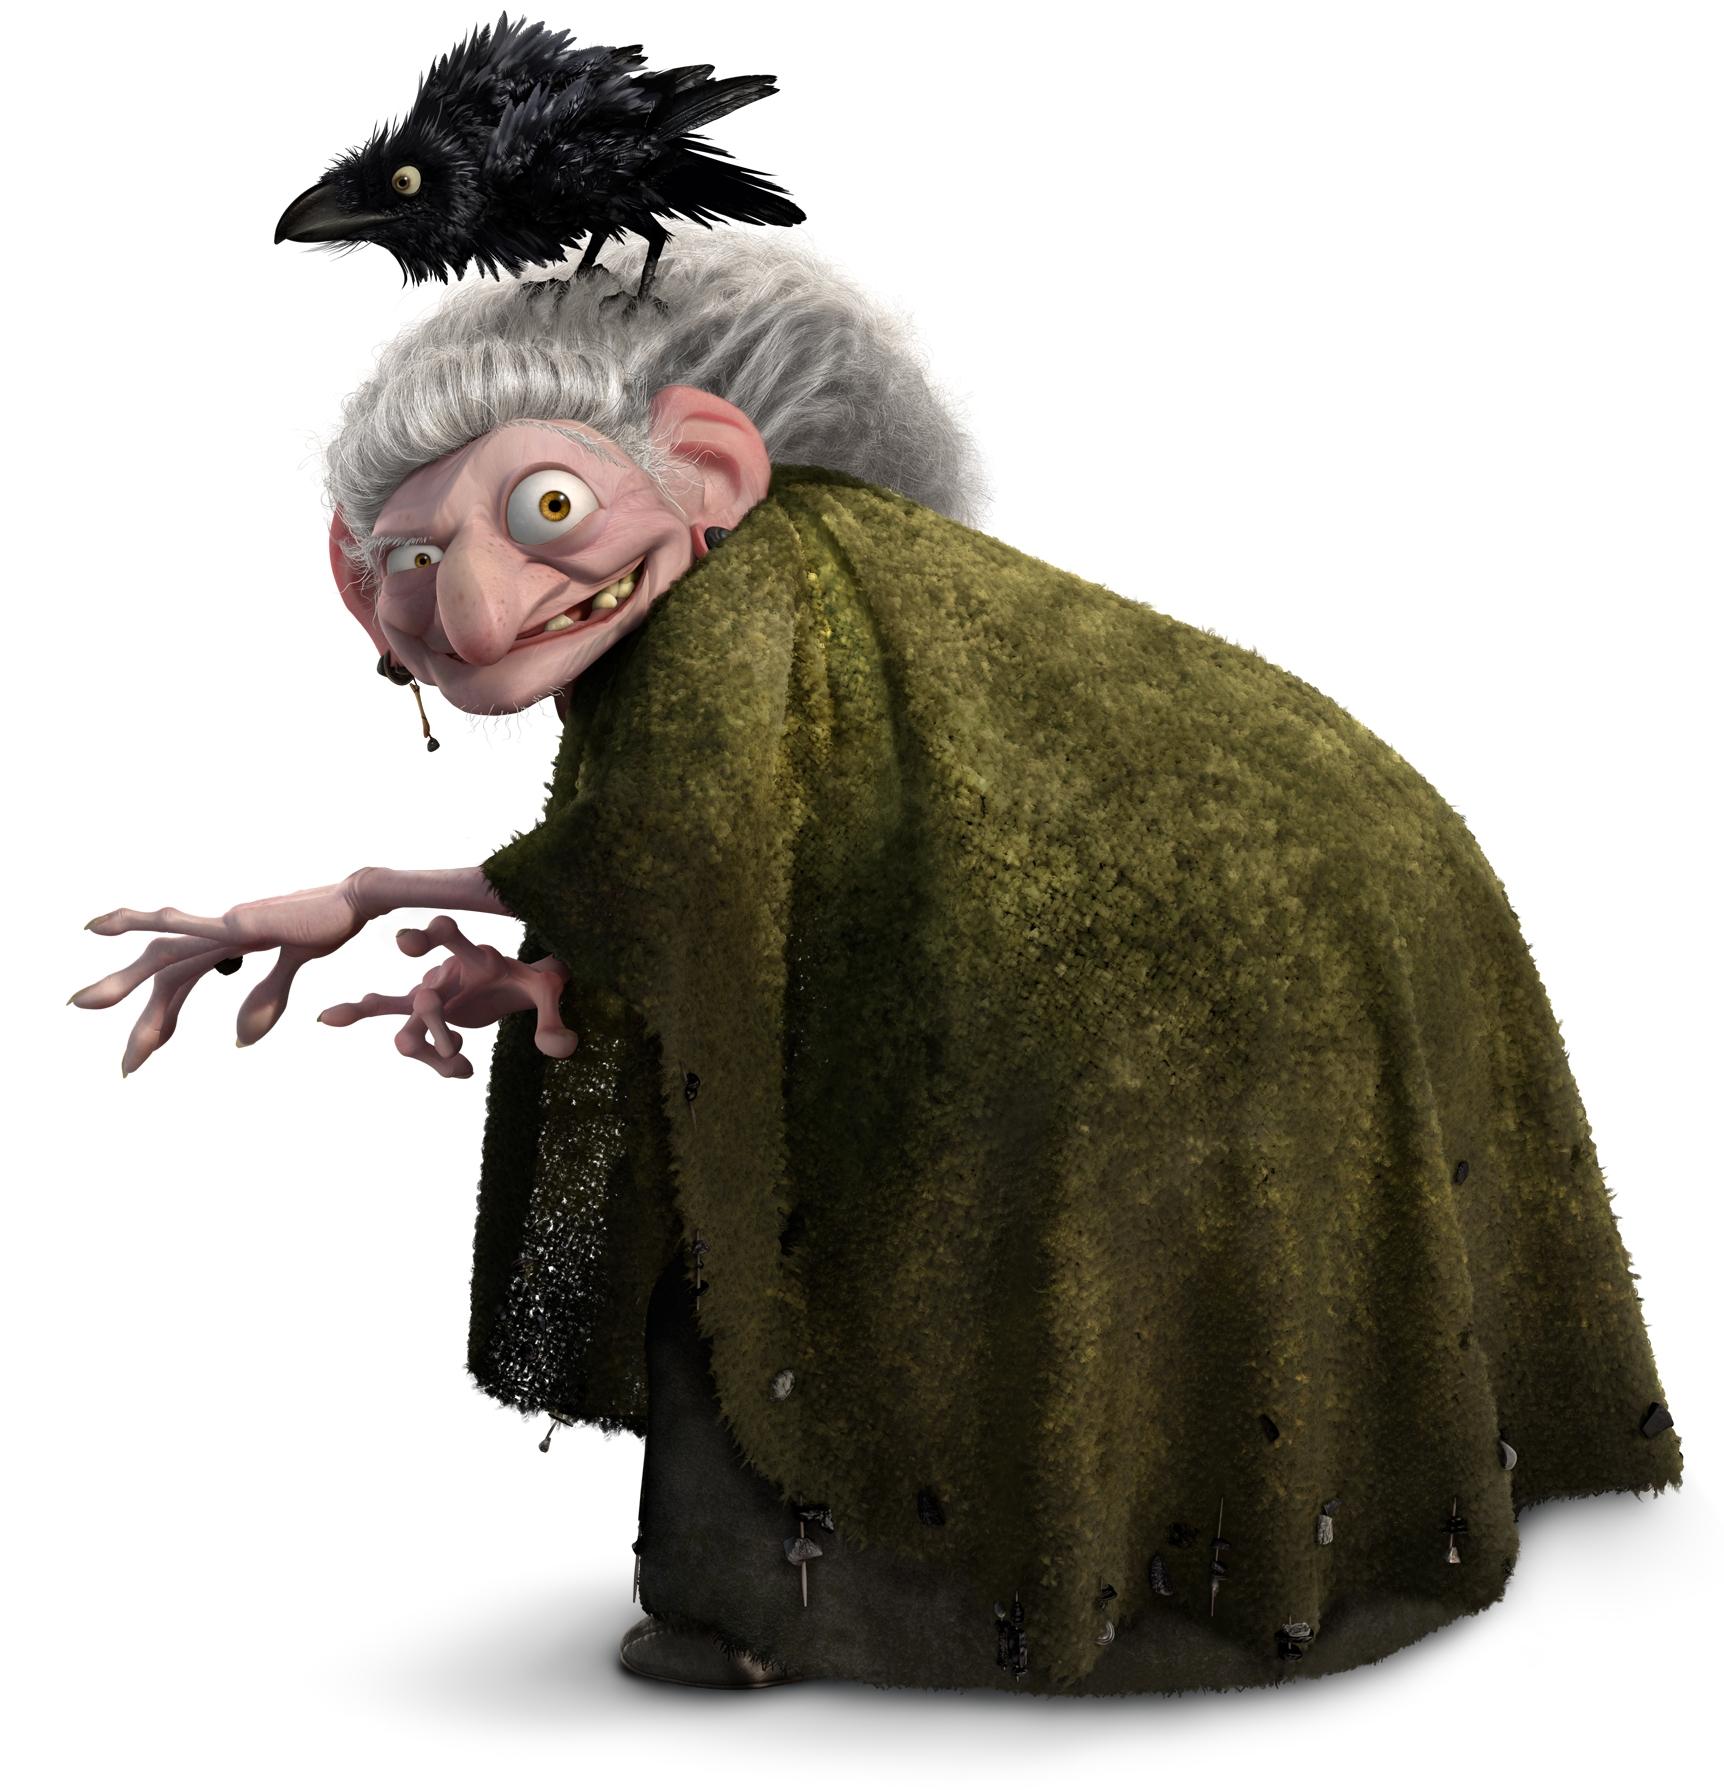 The Witch (Brave) - Disney Wiki